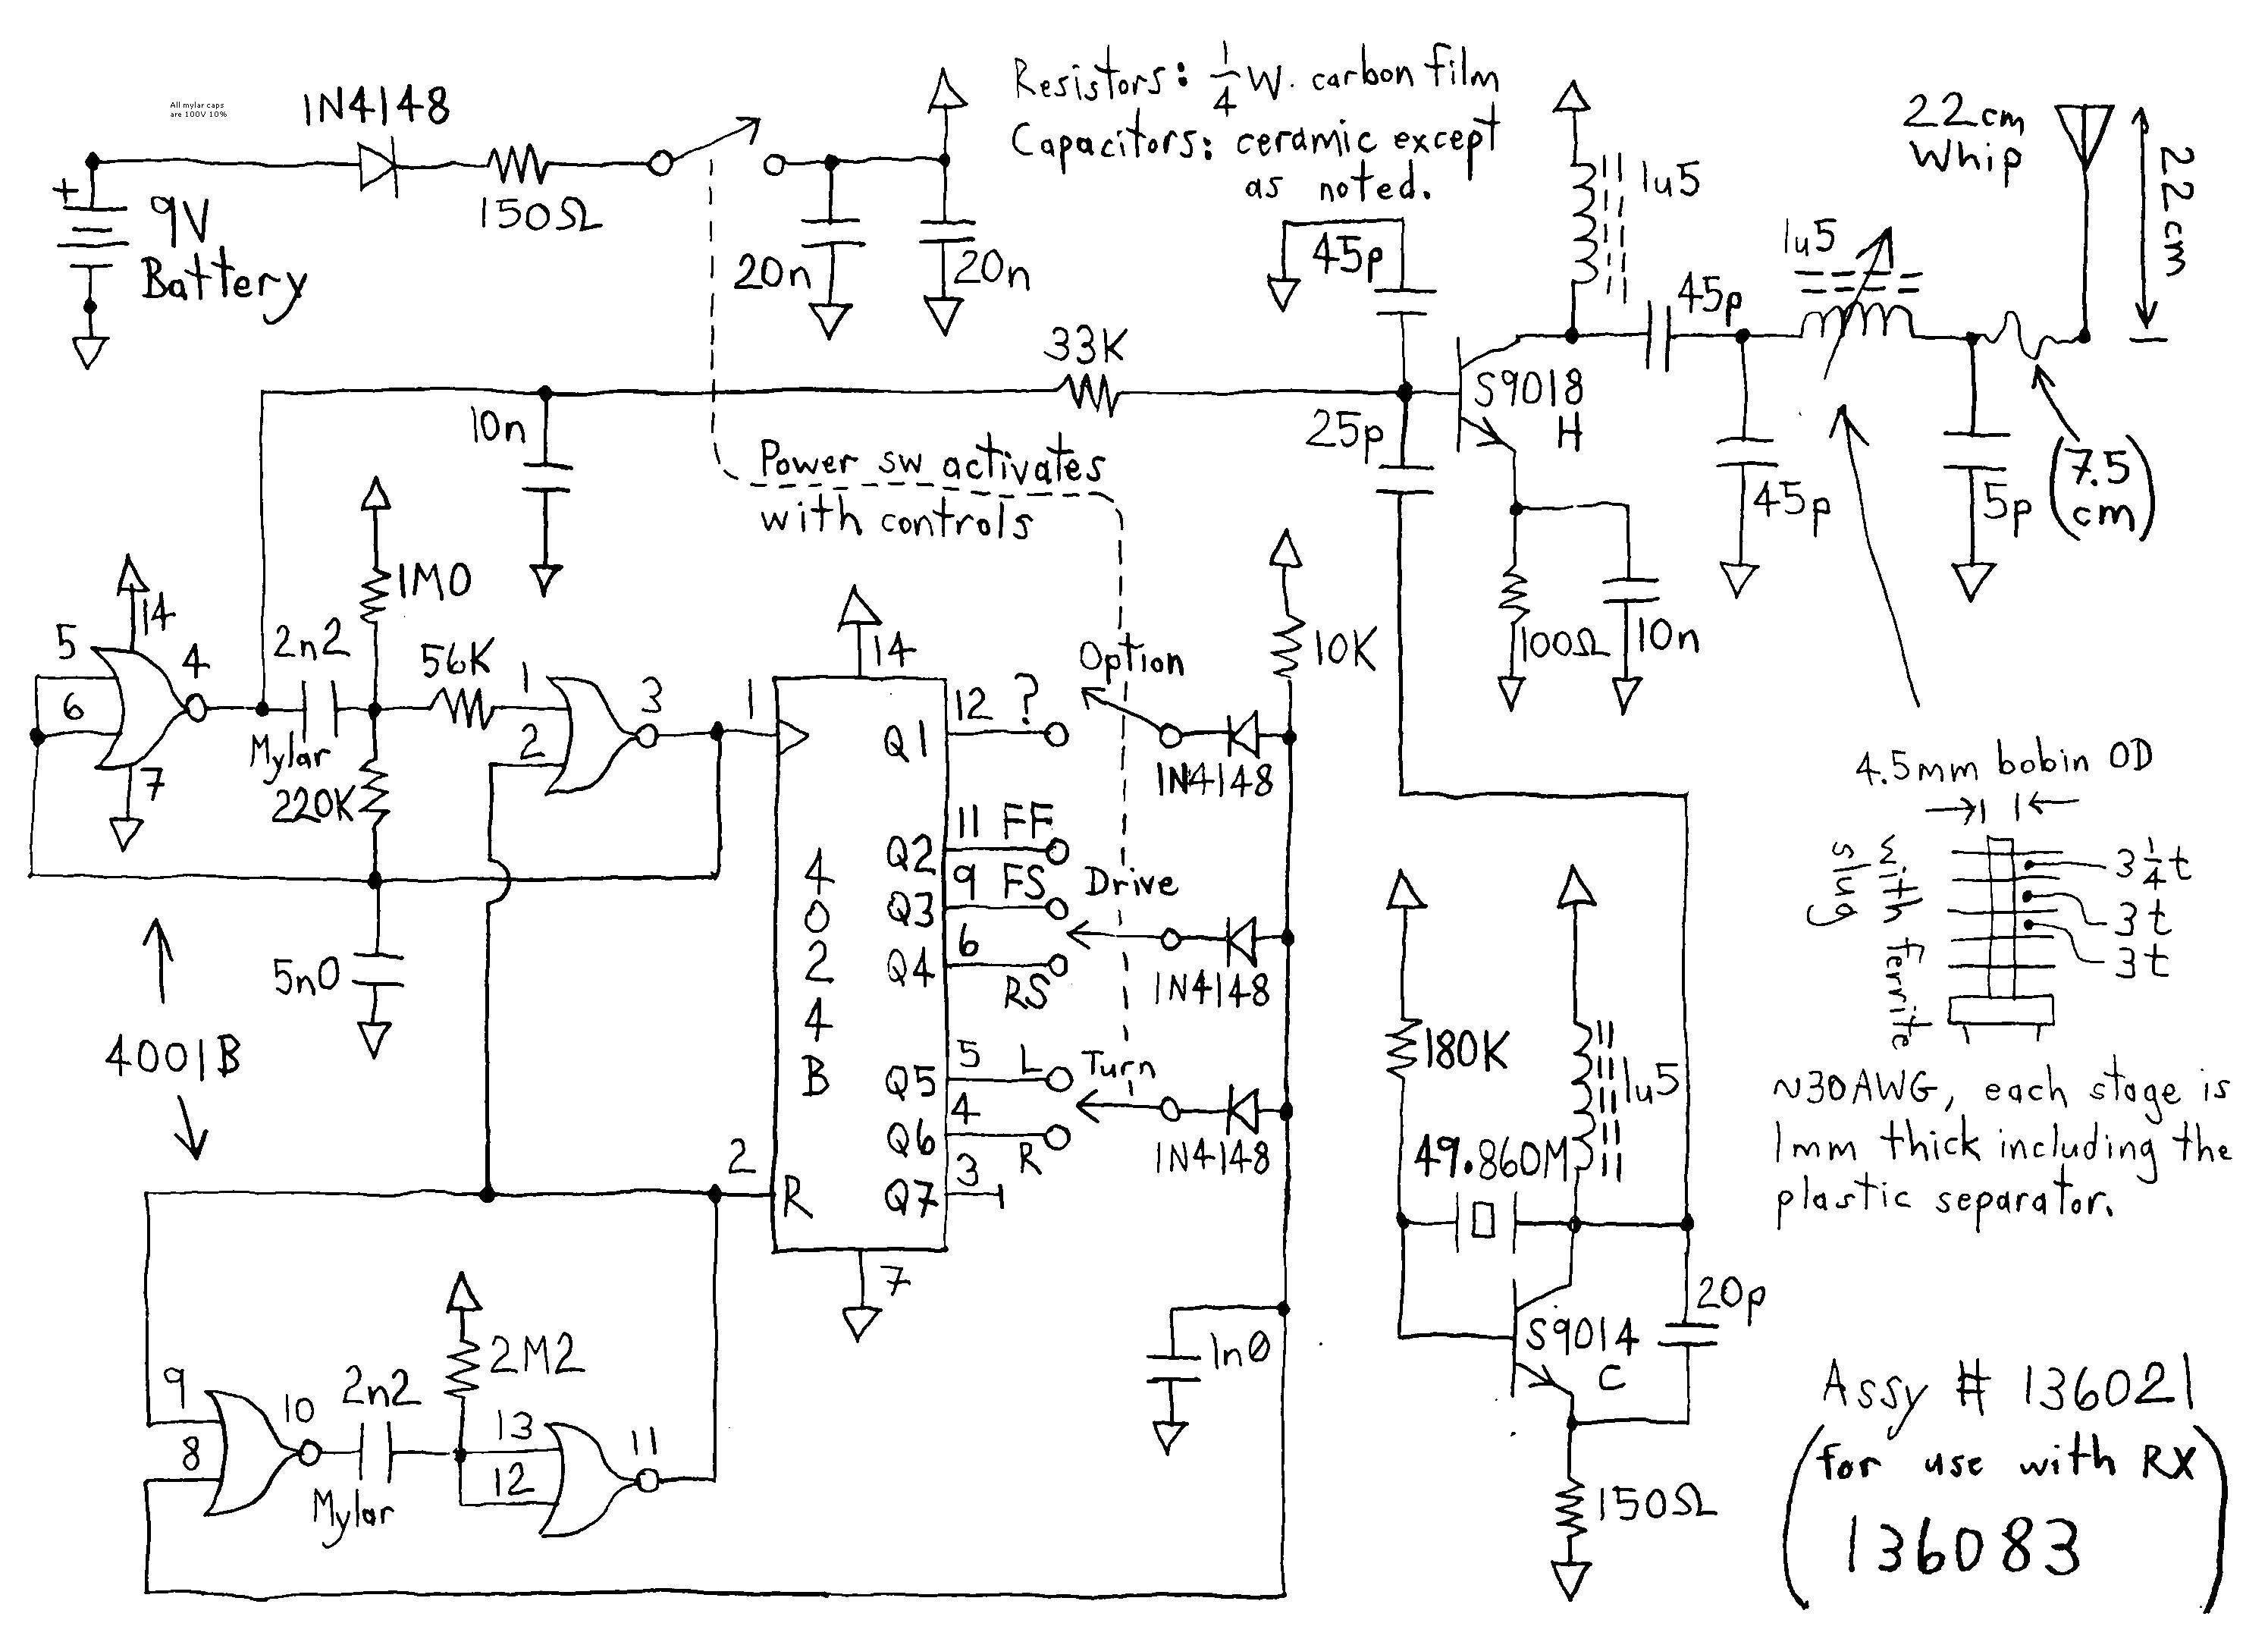 cm hoist wiring diagram free wiring diagramcm hoist wiring diagram wiring diagram for car hoist inspirationa